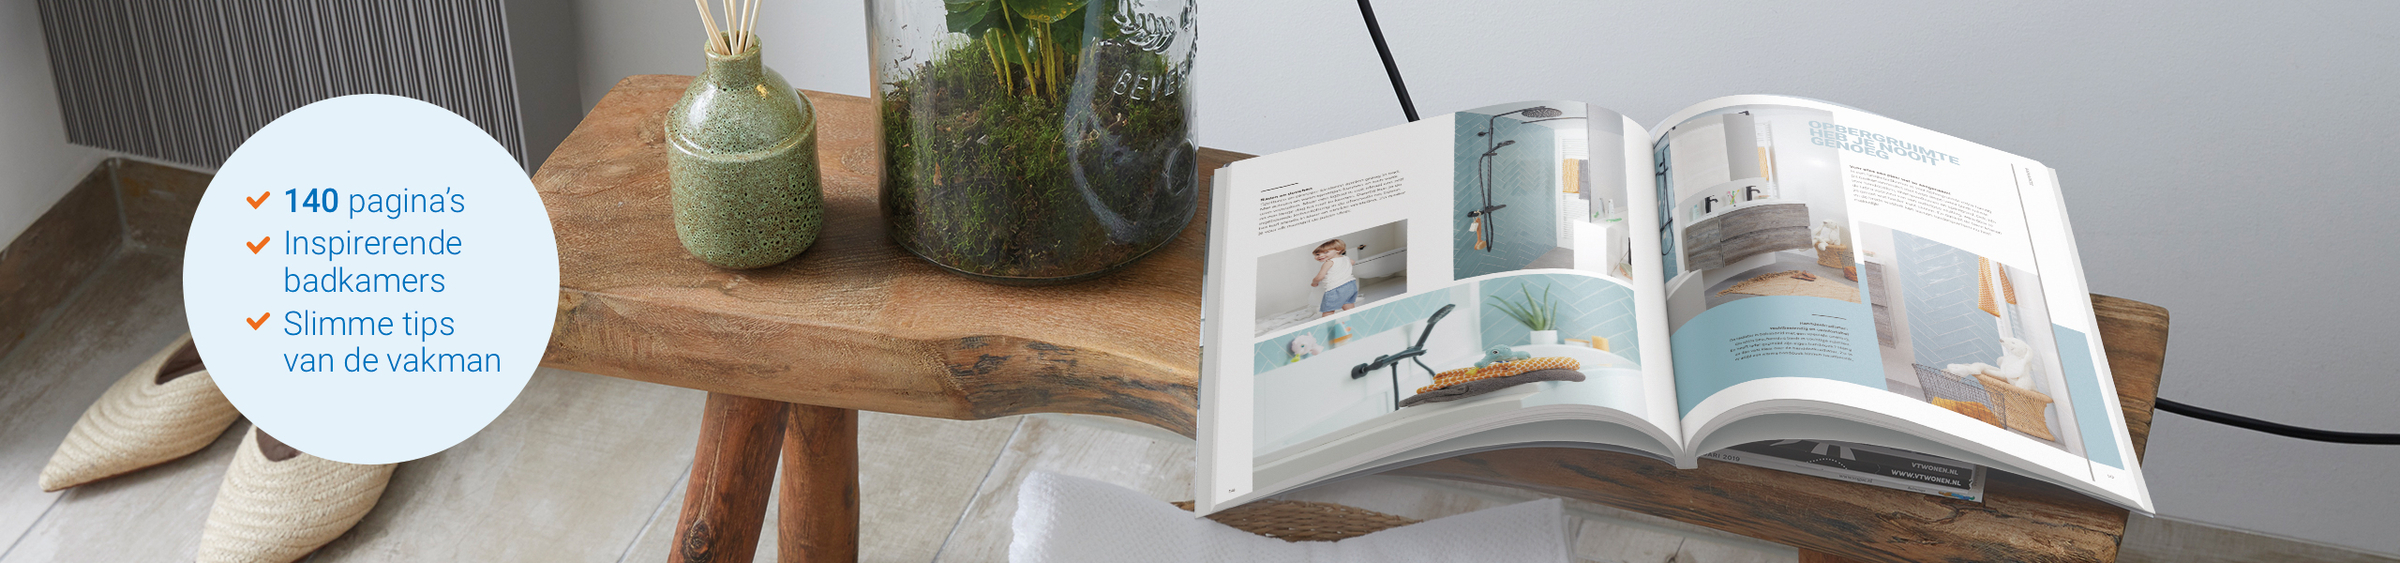 Badenplus badkamer inspiratieboek - Badenplus badkamer inspiratieboek